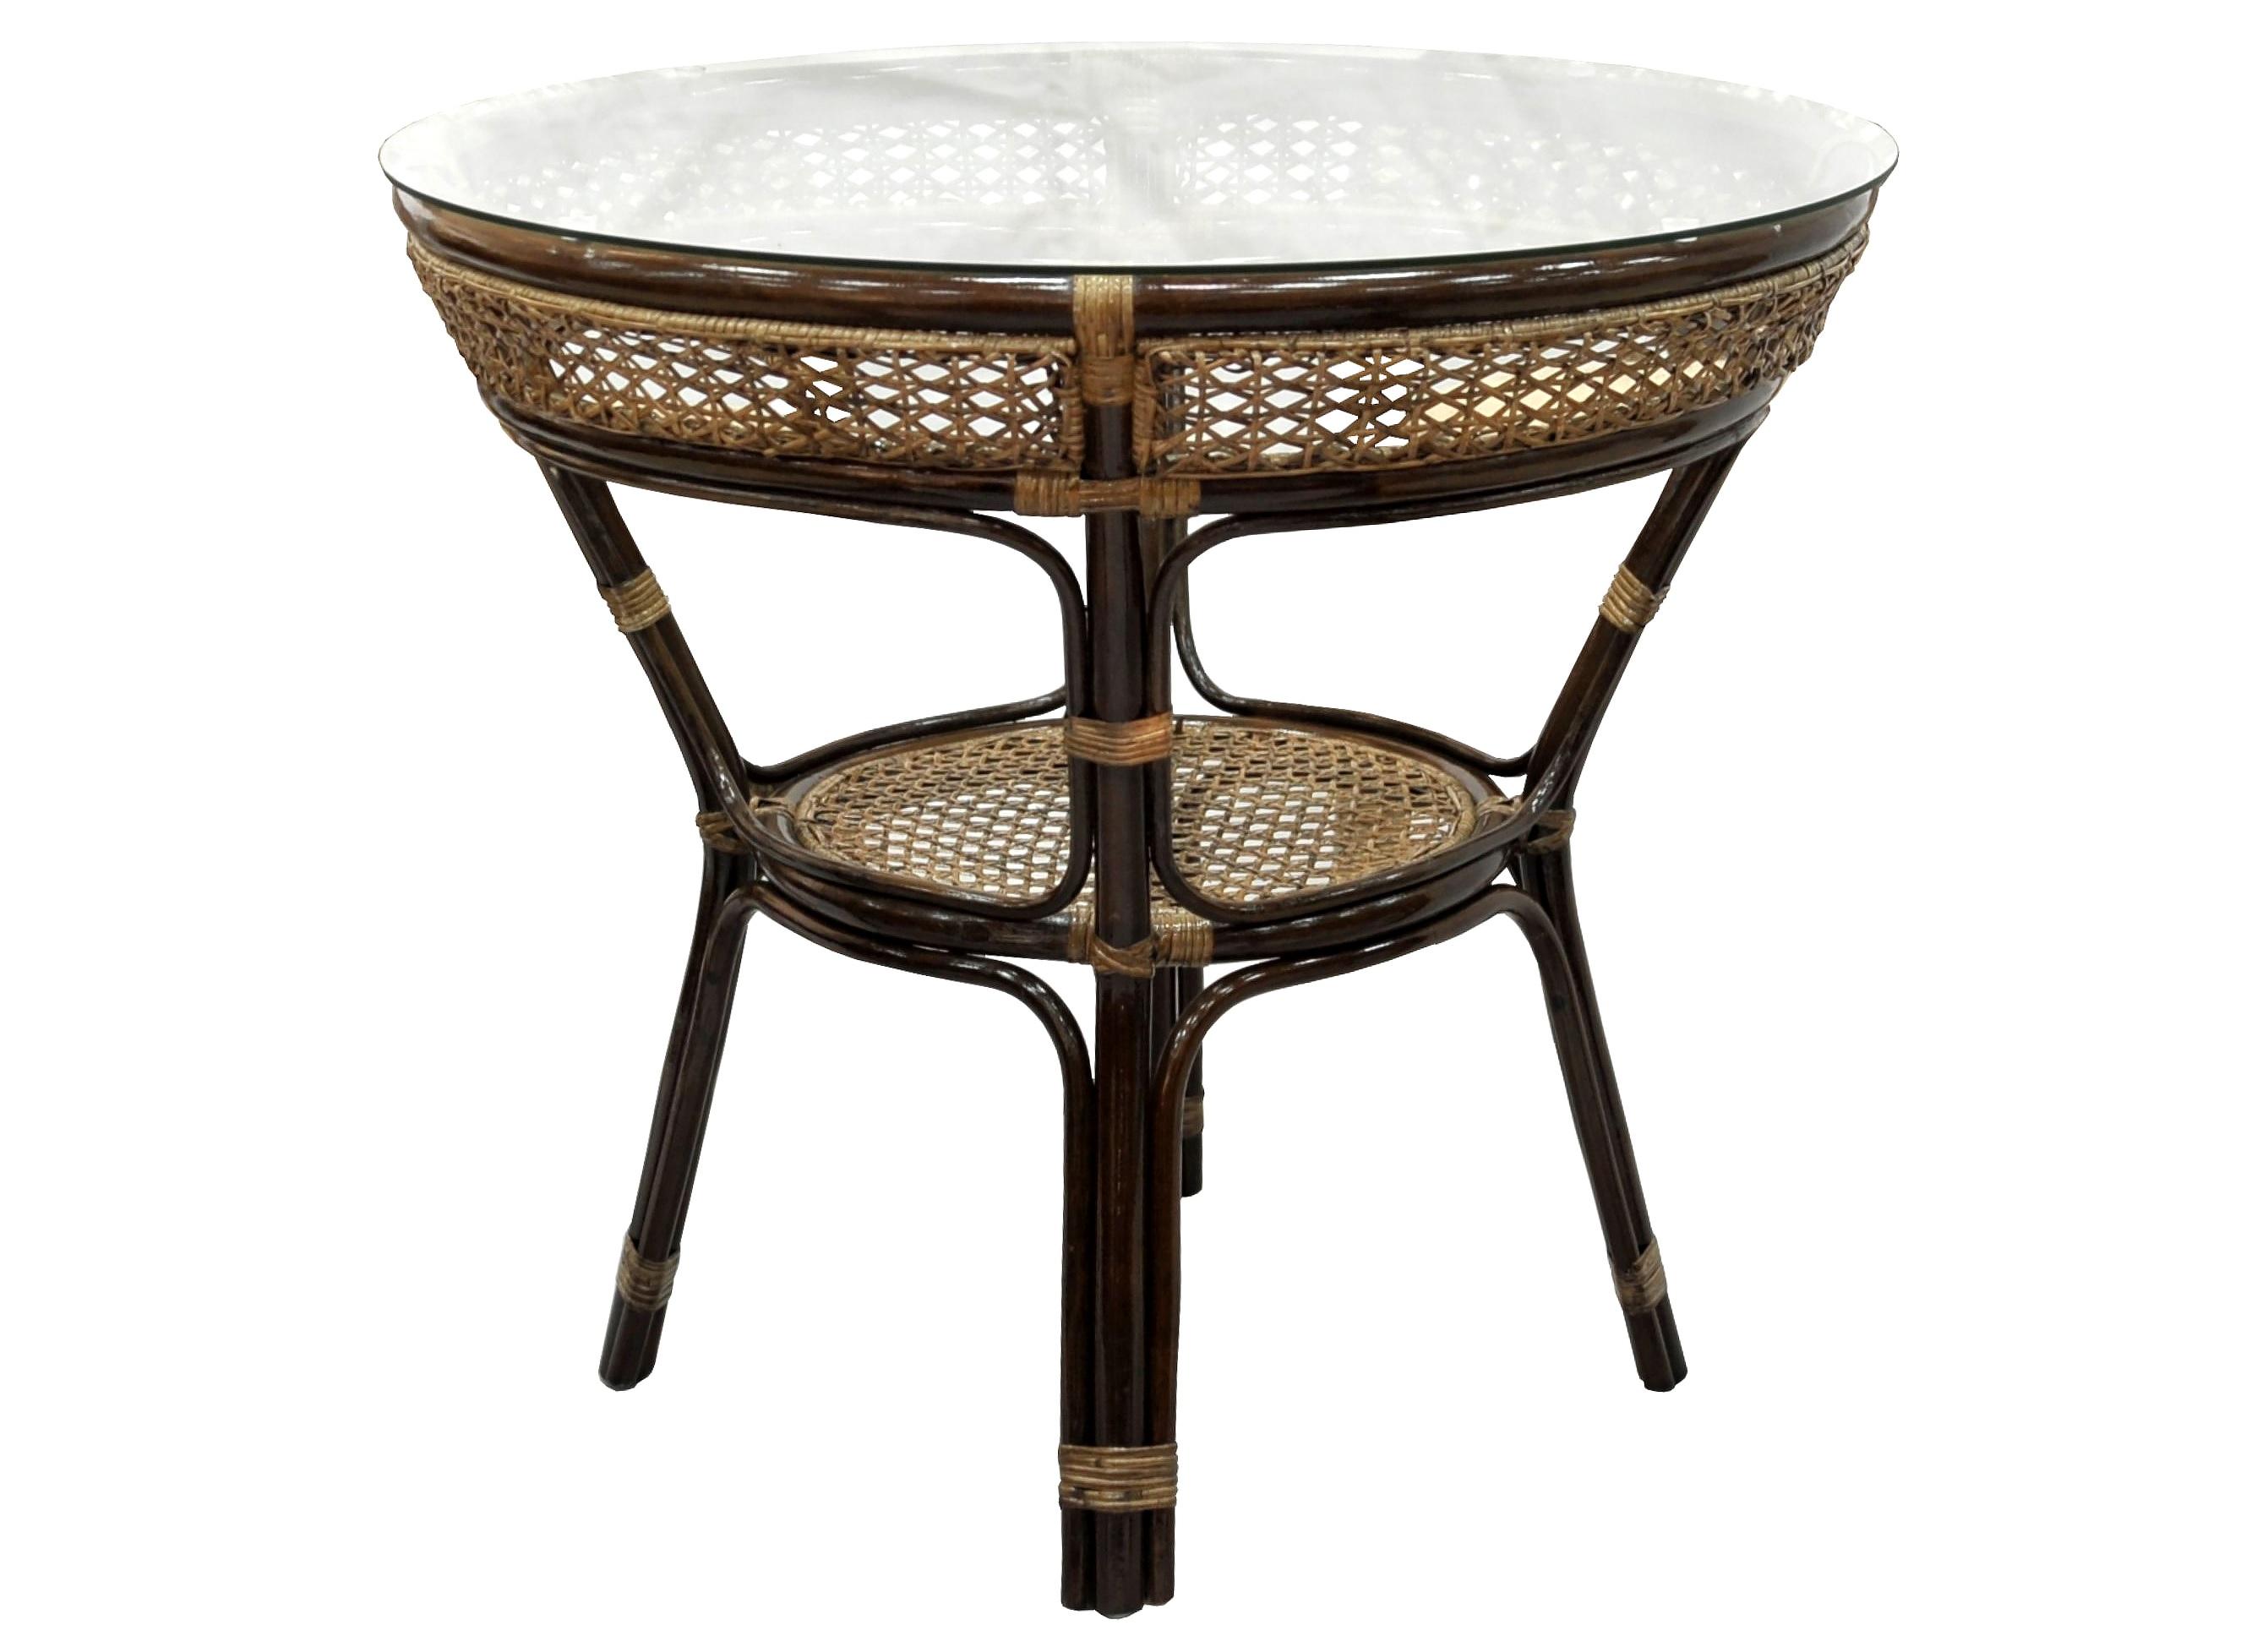 Стол обеденный JavaСтолы и столики для сада<br><br><br>Material: Ротанг<br>Height см: 75<br>Diameter см: 83